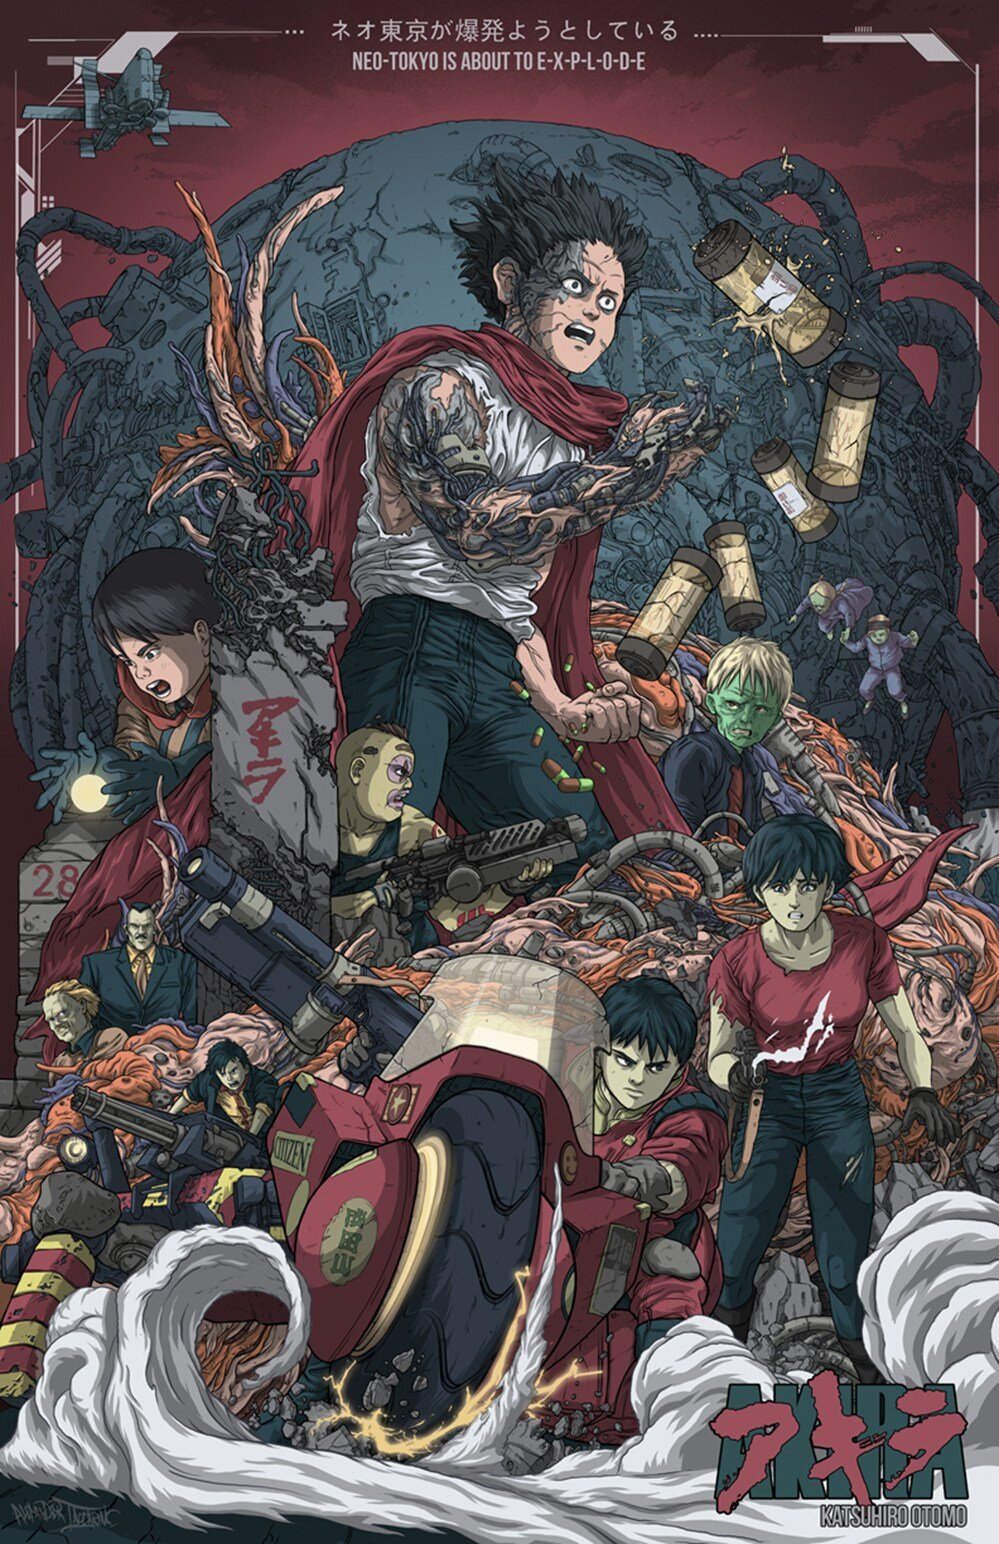 Akira-Poster-by-Alexander-Iaccarino.jpg